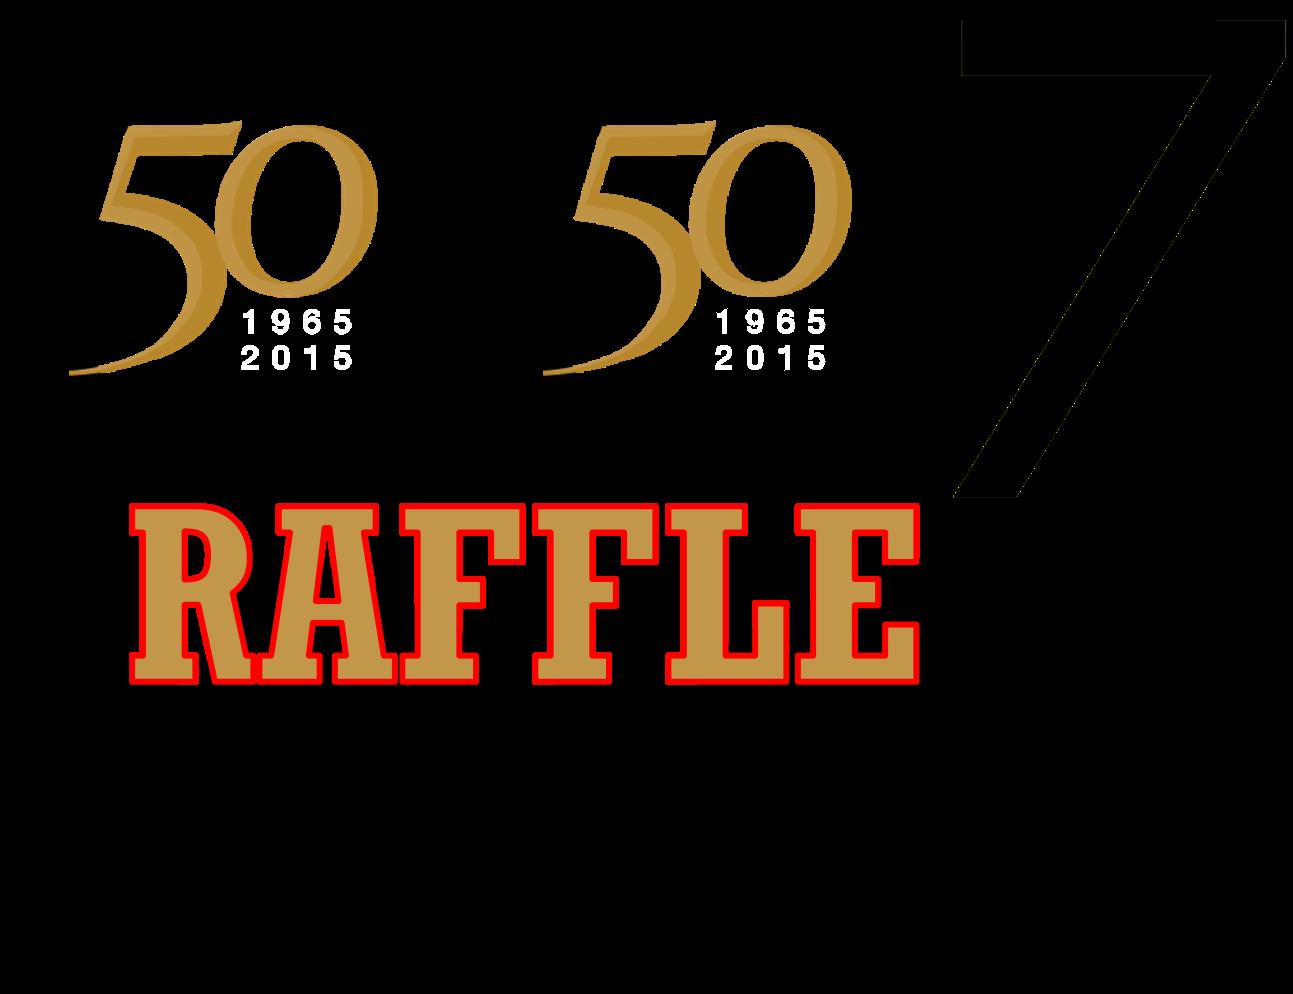 50-50 Raffle